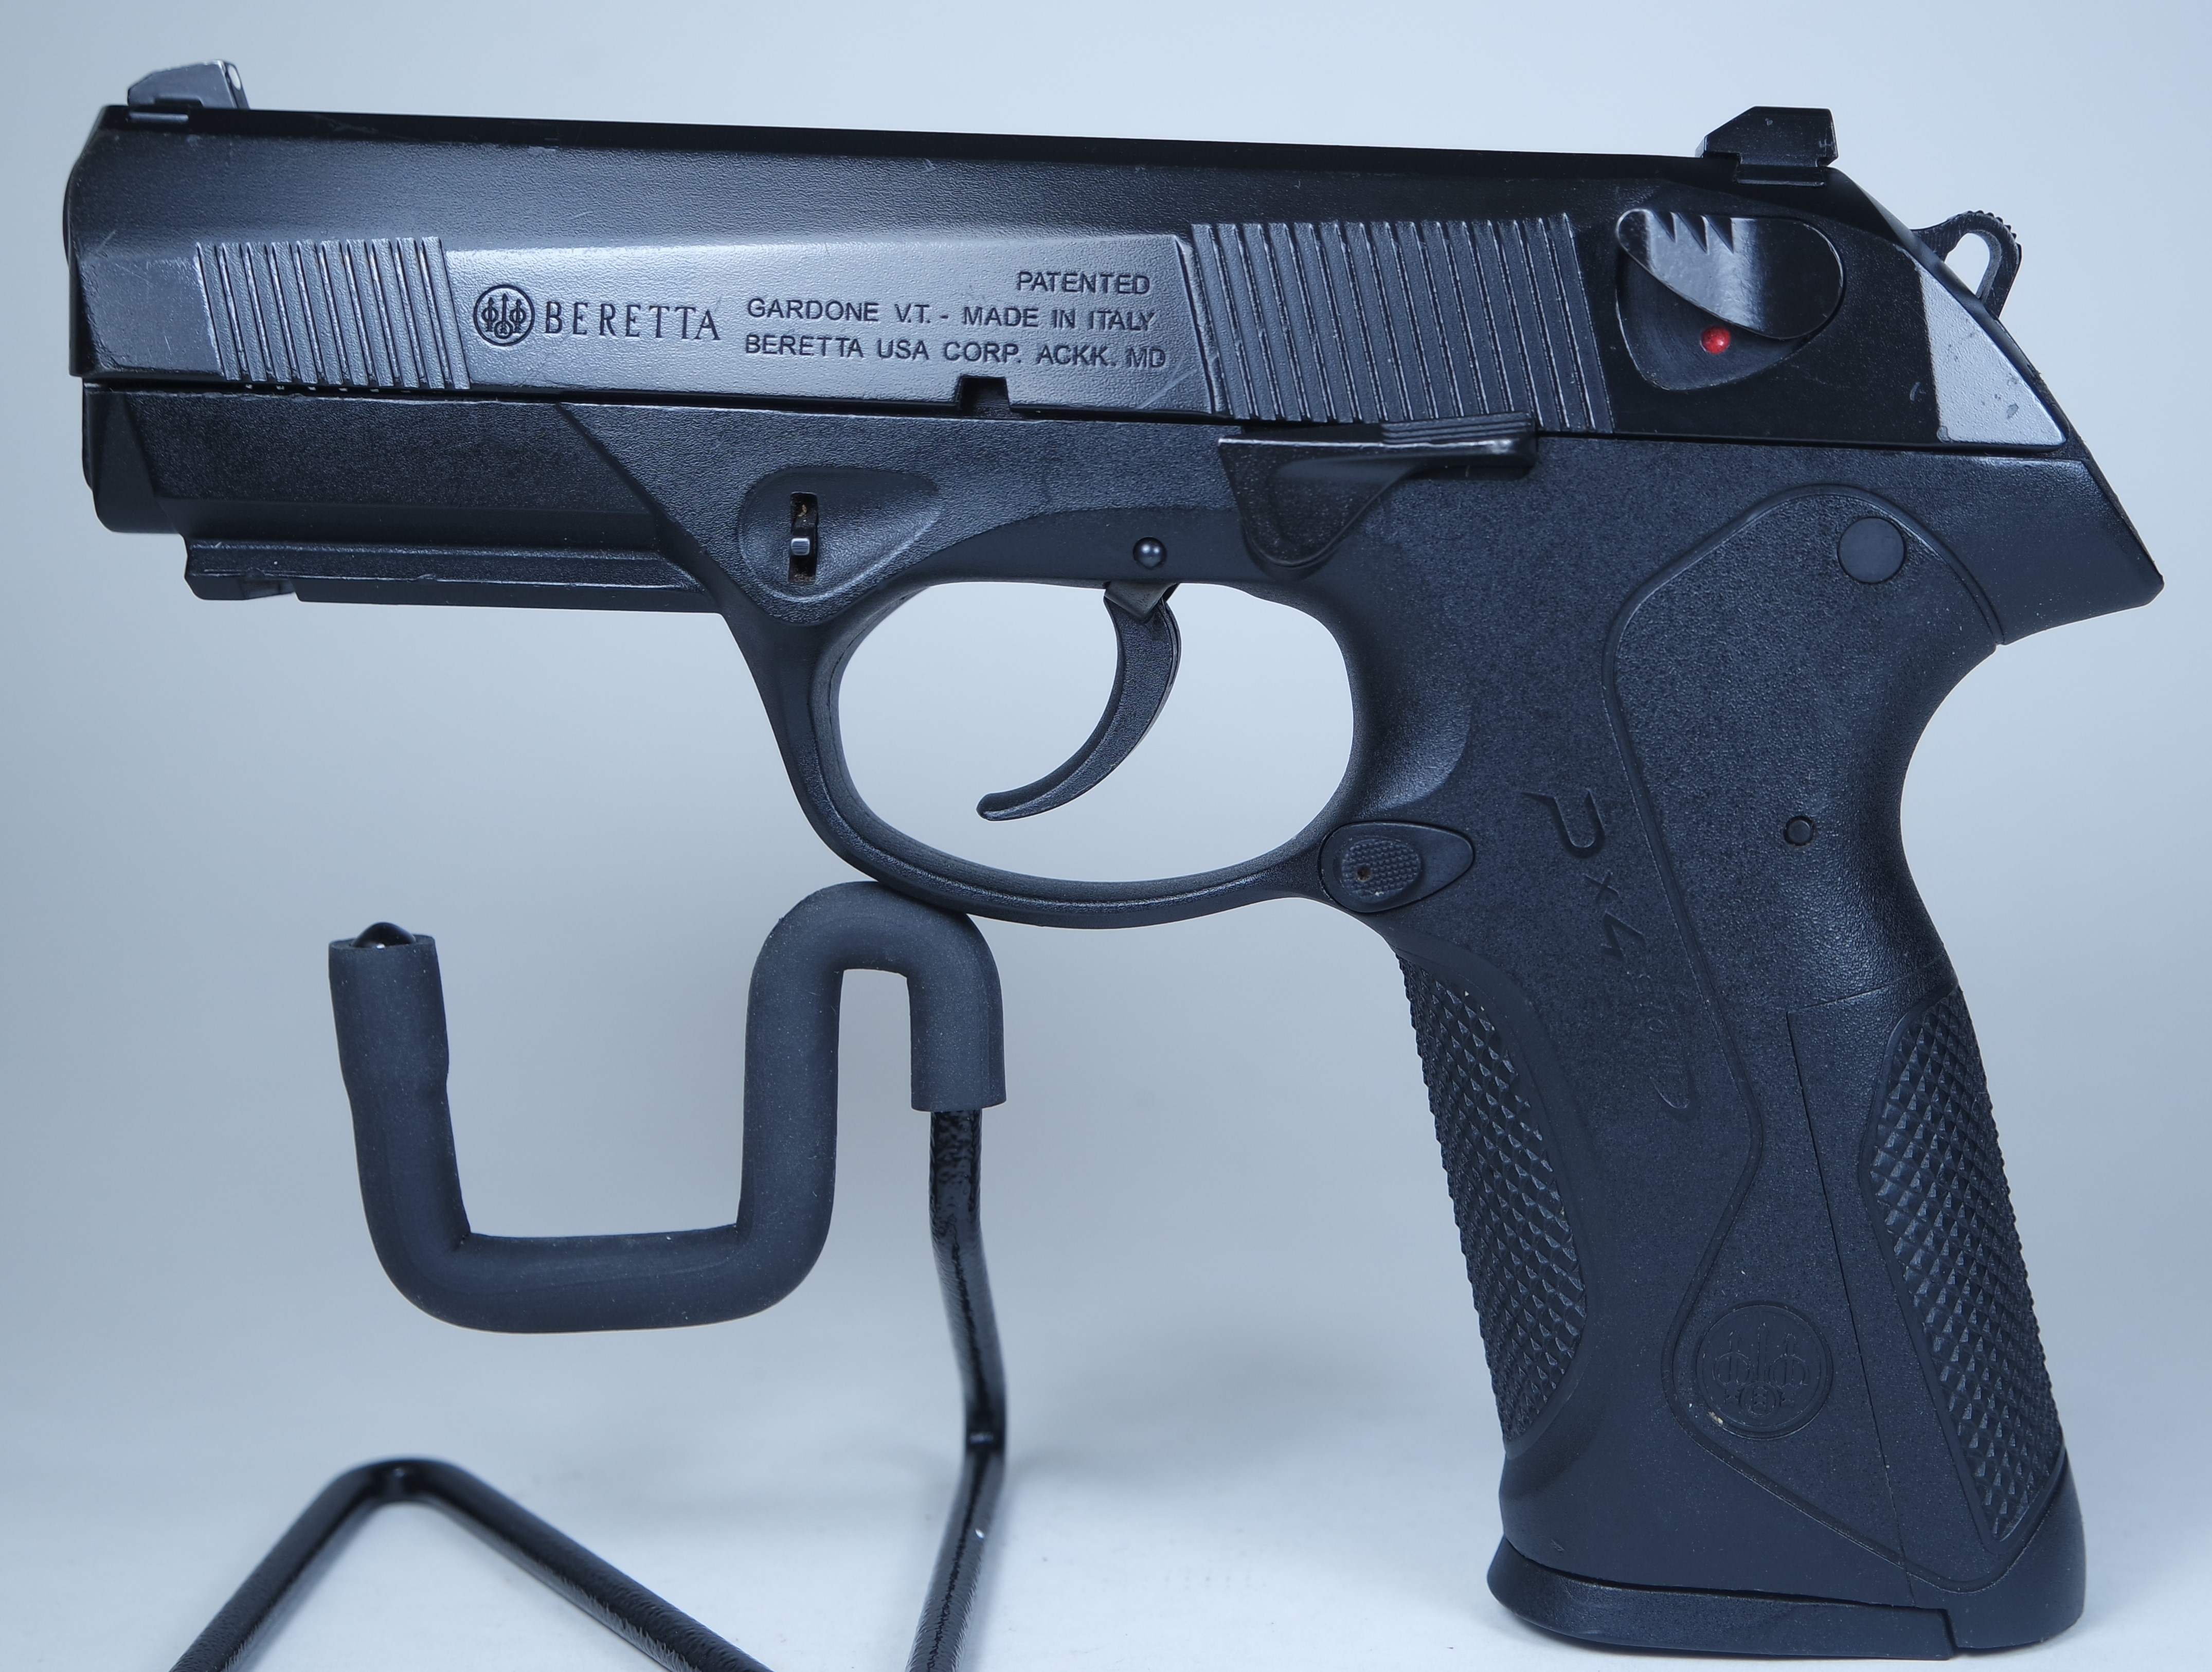 Beretta PX4 Storm Full Size Semi-Auto .40 S&W Pistol Pre-Owned